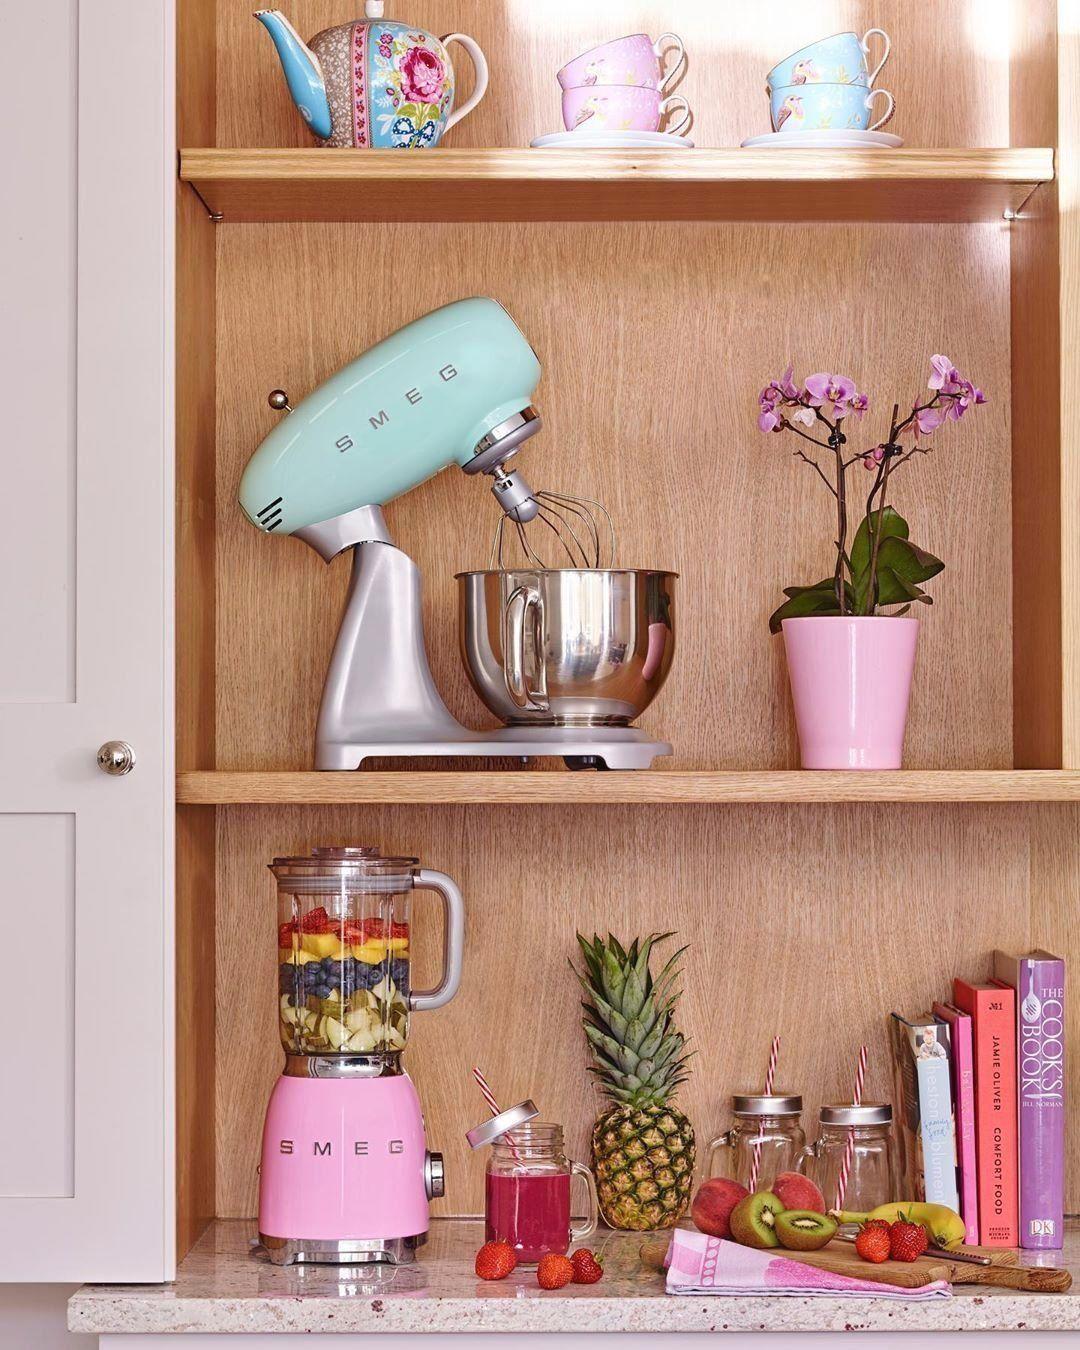 "Smeg UK Ltd on Instagram ""Your kitchen appliances don't"